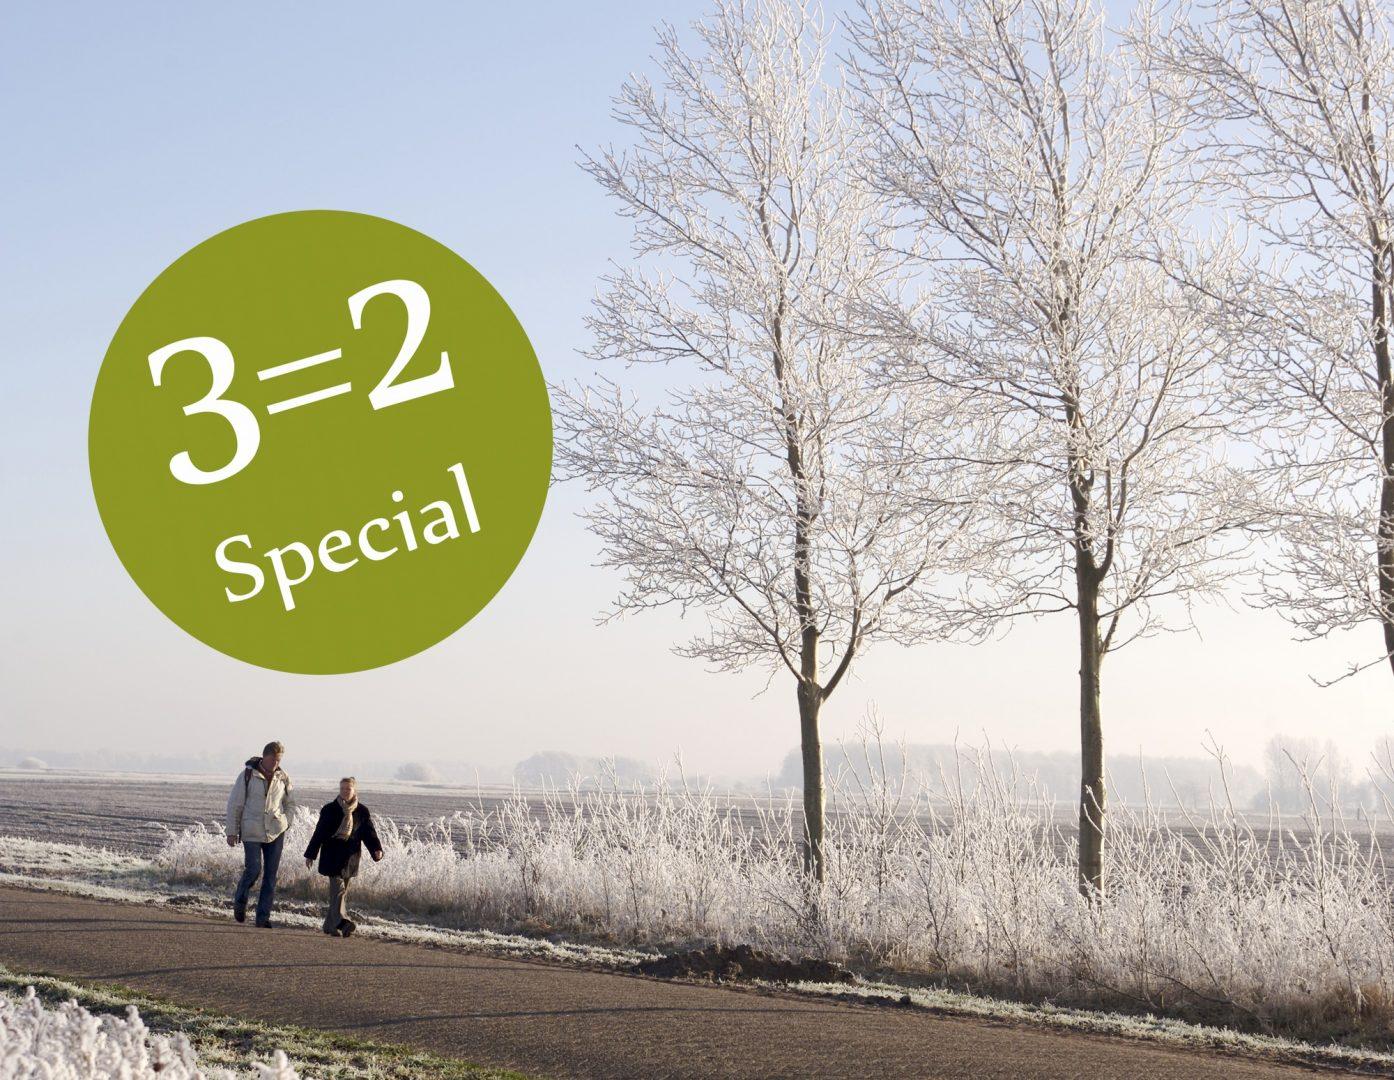 Hotel aanbieding Drenthe - Winterspecial 3=2